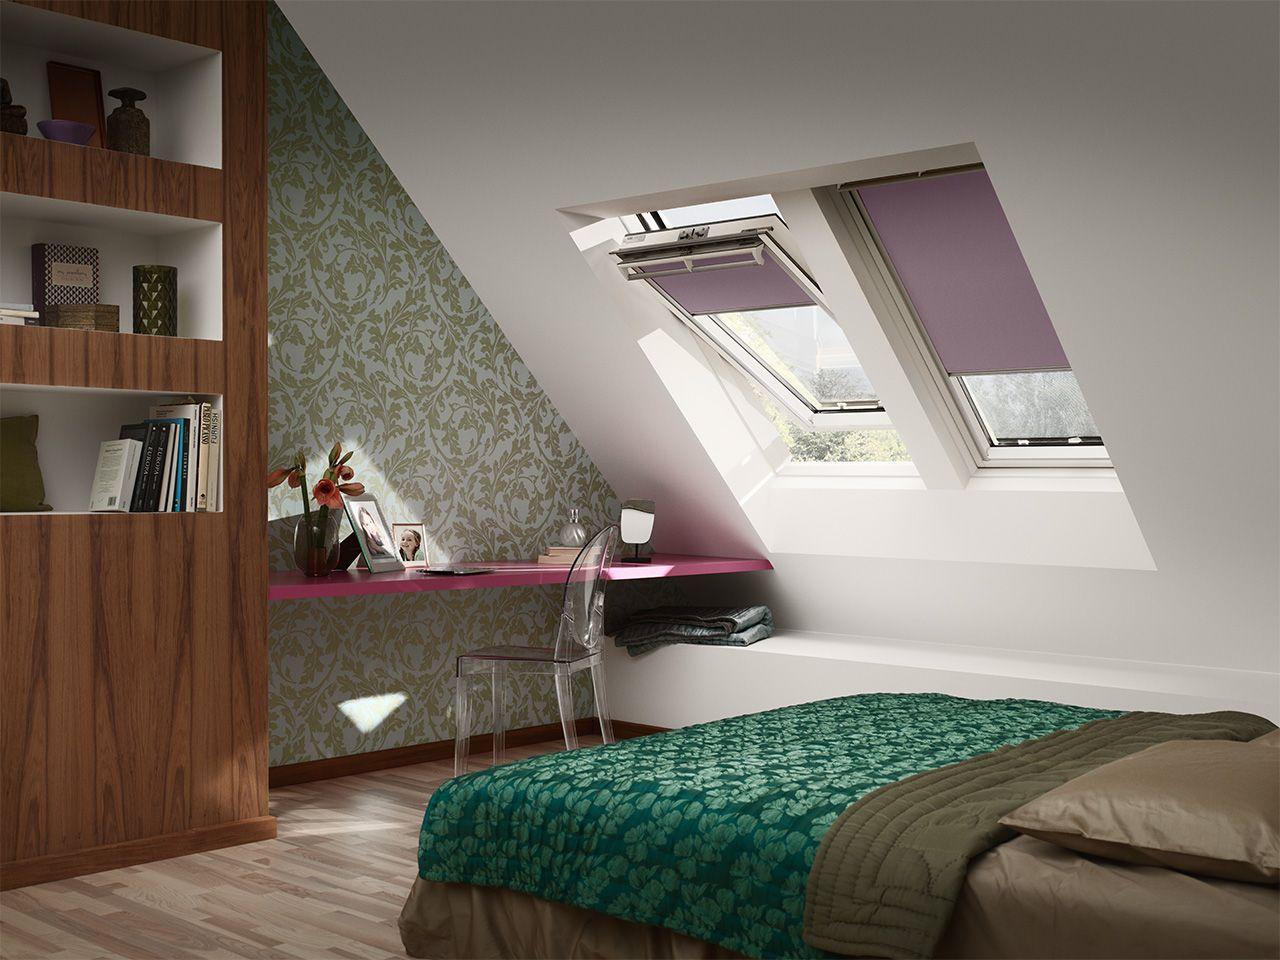 ventana giratoria 1280x960